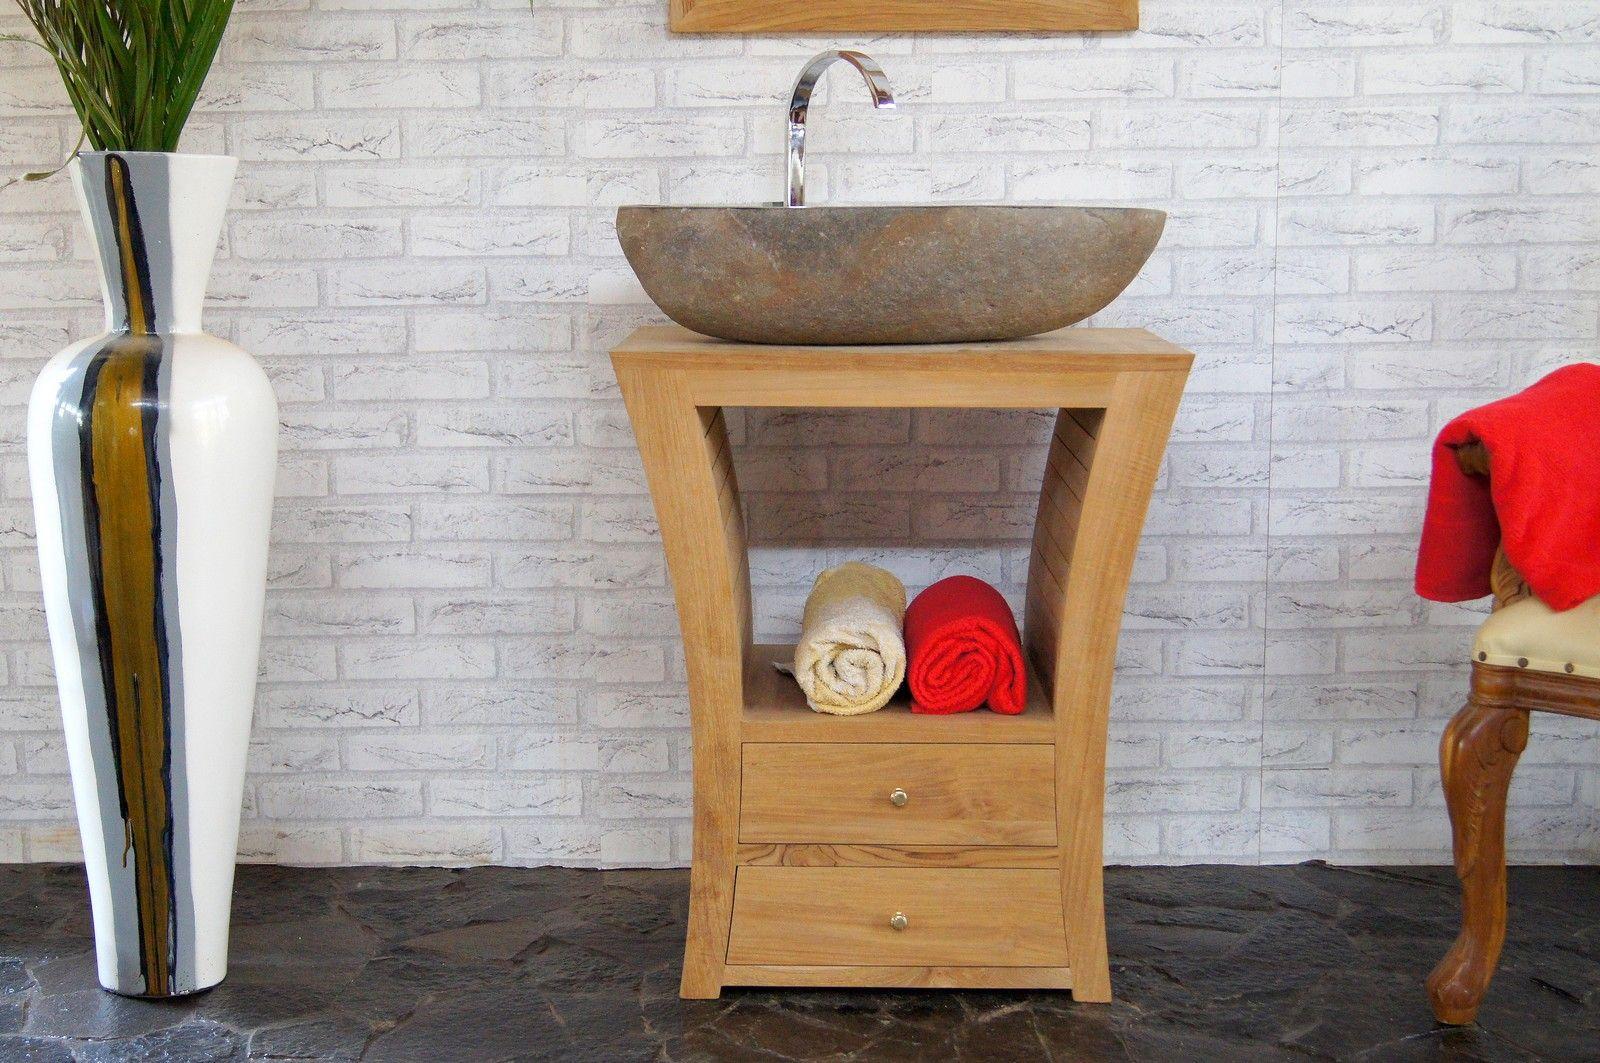 Badschrank Holz Massiv Latest Akl Unterbau Bad Badschrank Waschbecken With Badschrank Holz